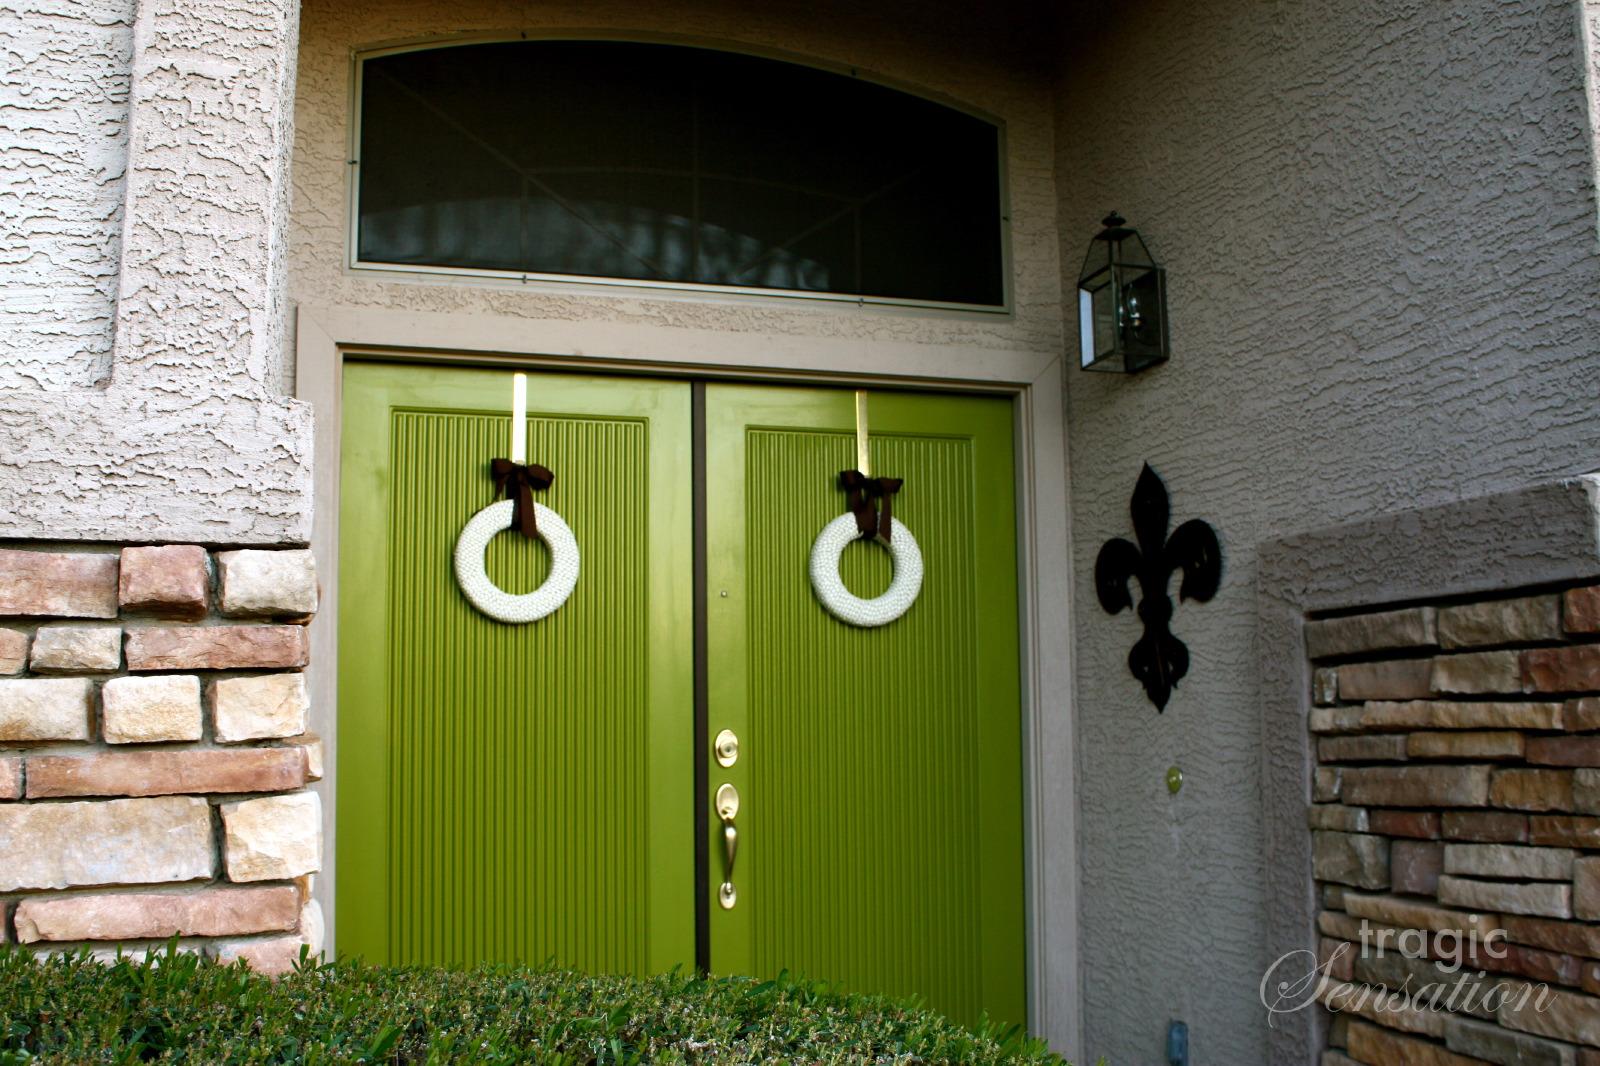 Tragic Sensation Behind The Green Doors